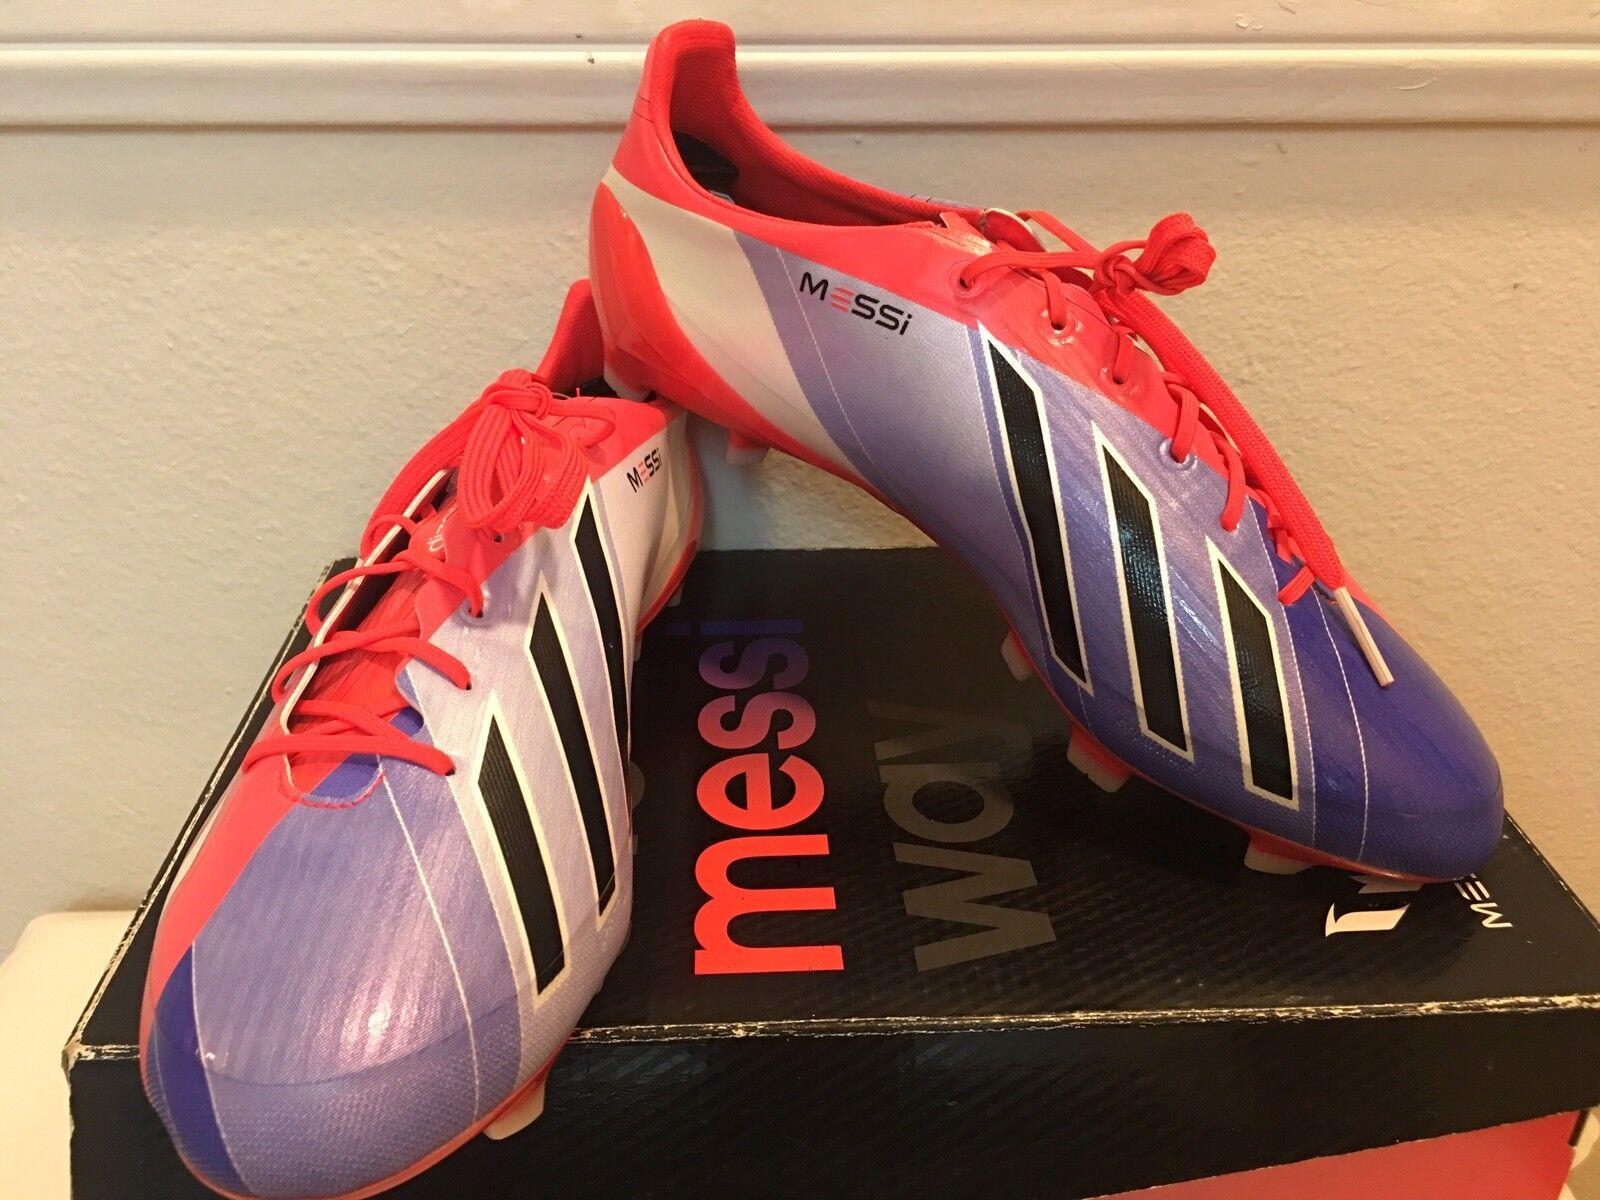 Adidas para hombre F50 Adizero Messi Trx Fg Botines